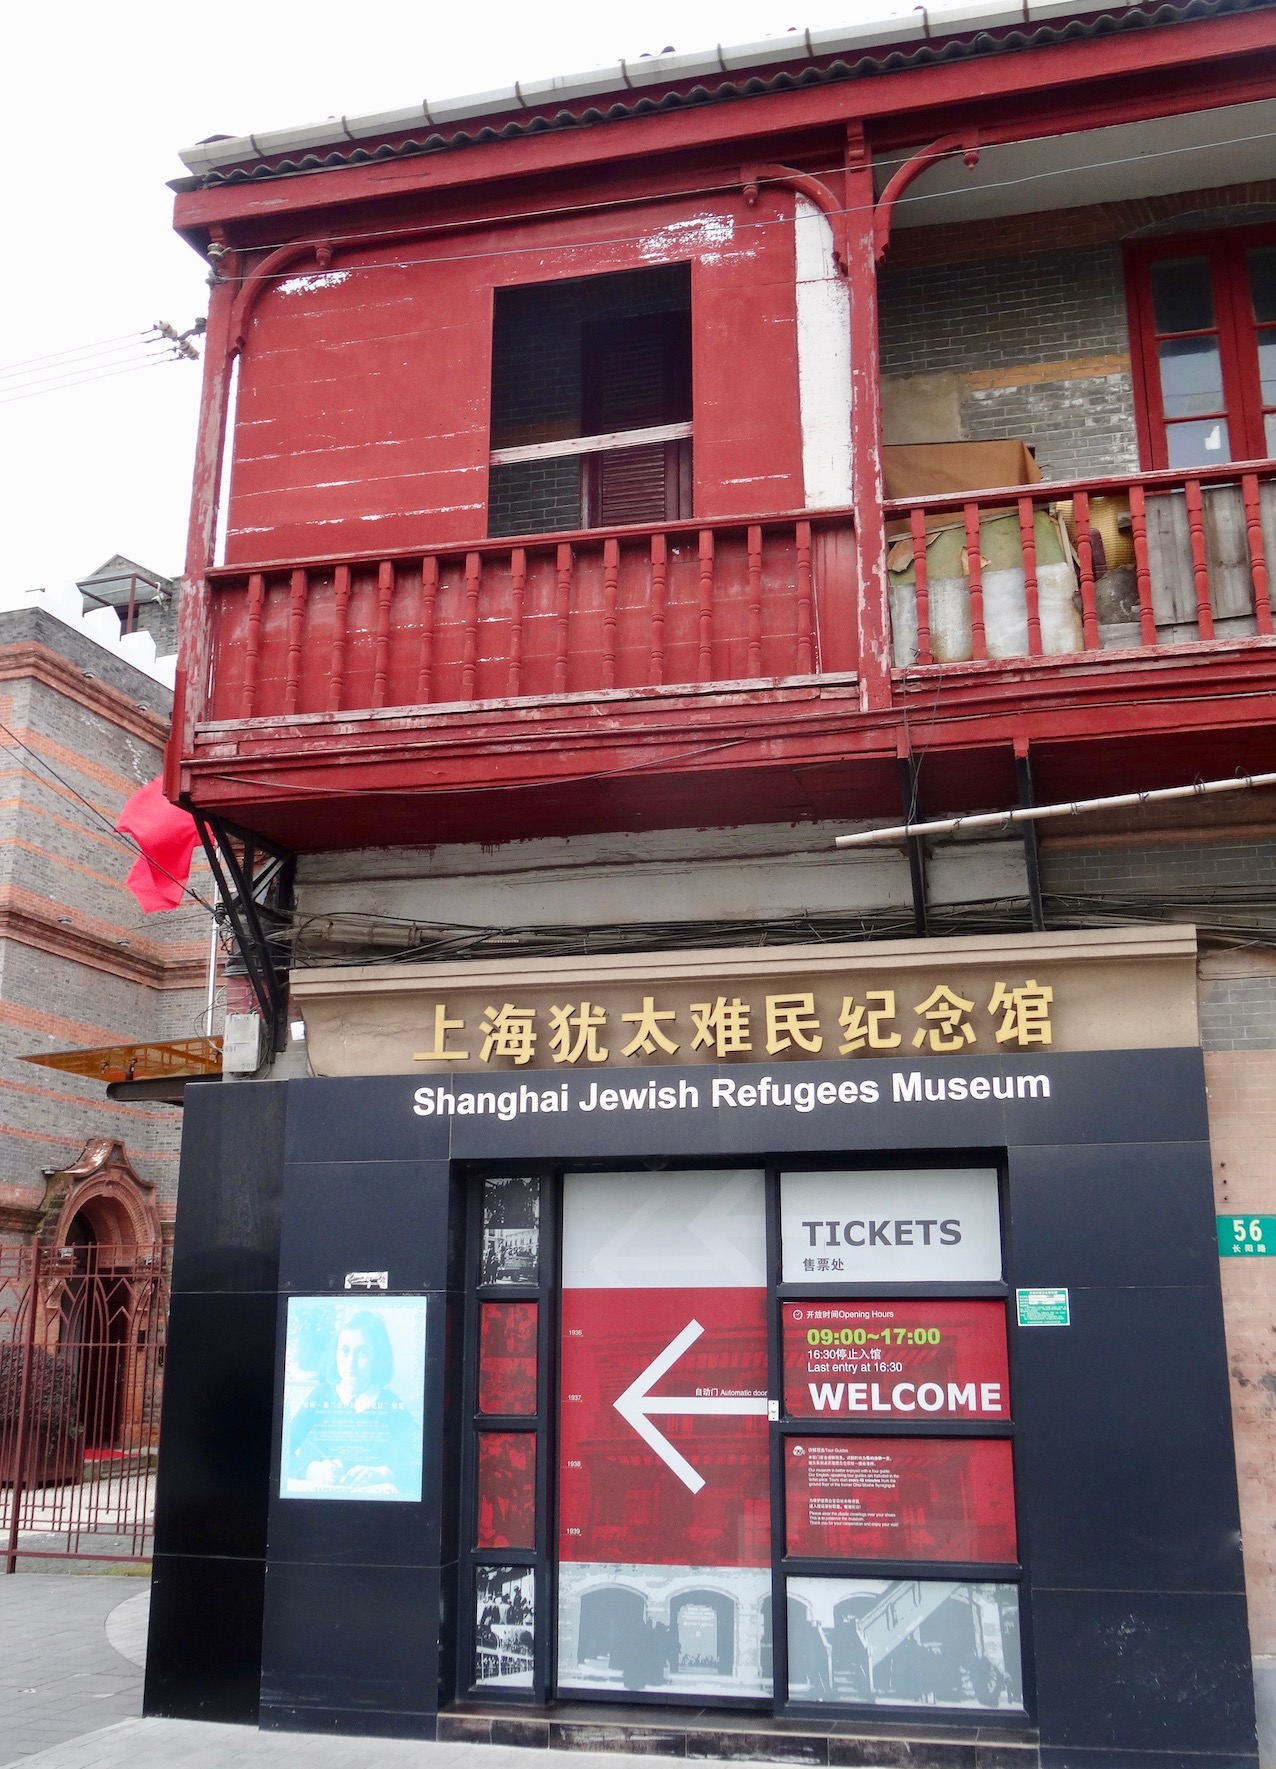 Shanghai Jewish Refugees Museum.